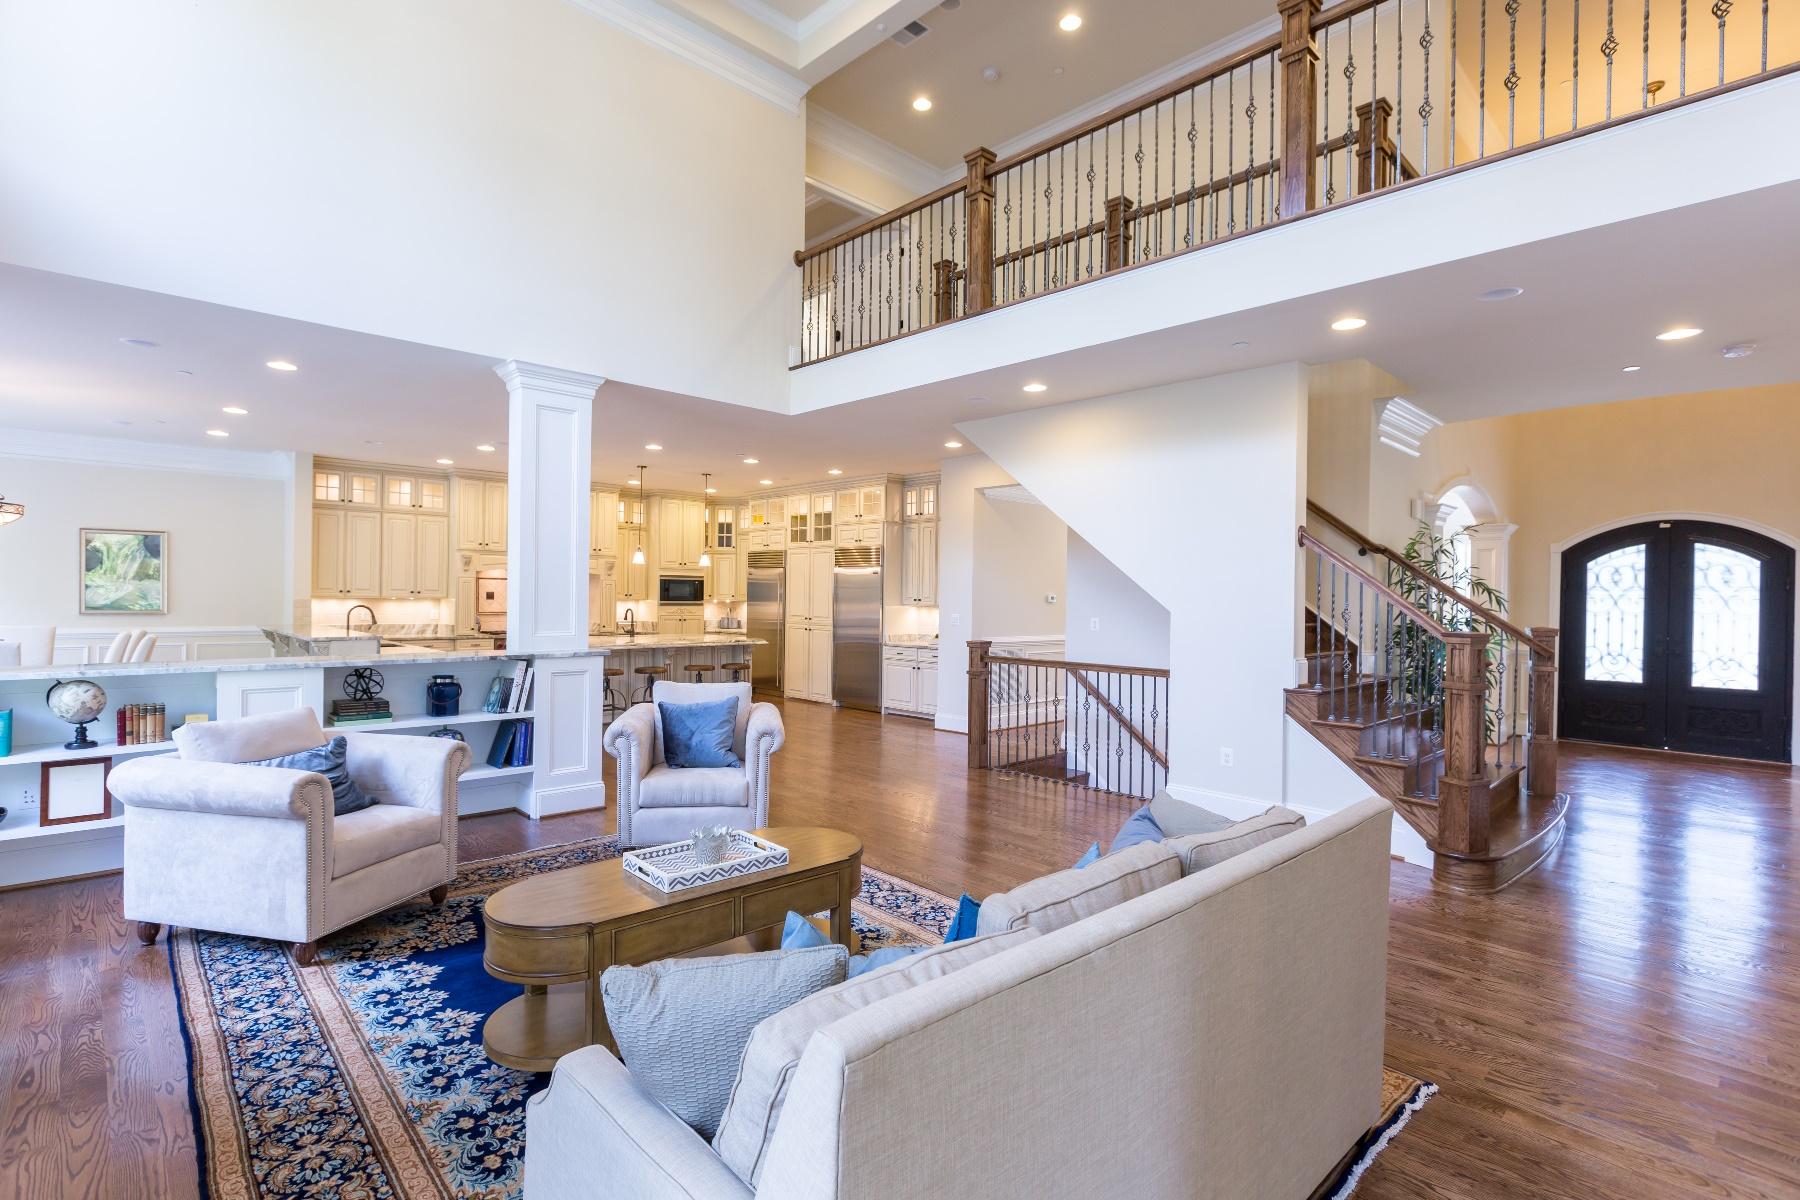 Additional photo for property listing at 8560 Horseshoe Lane, Potomac 8560 Horseshoe Ln Potomac, 馬里蘭州 20854 美國